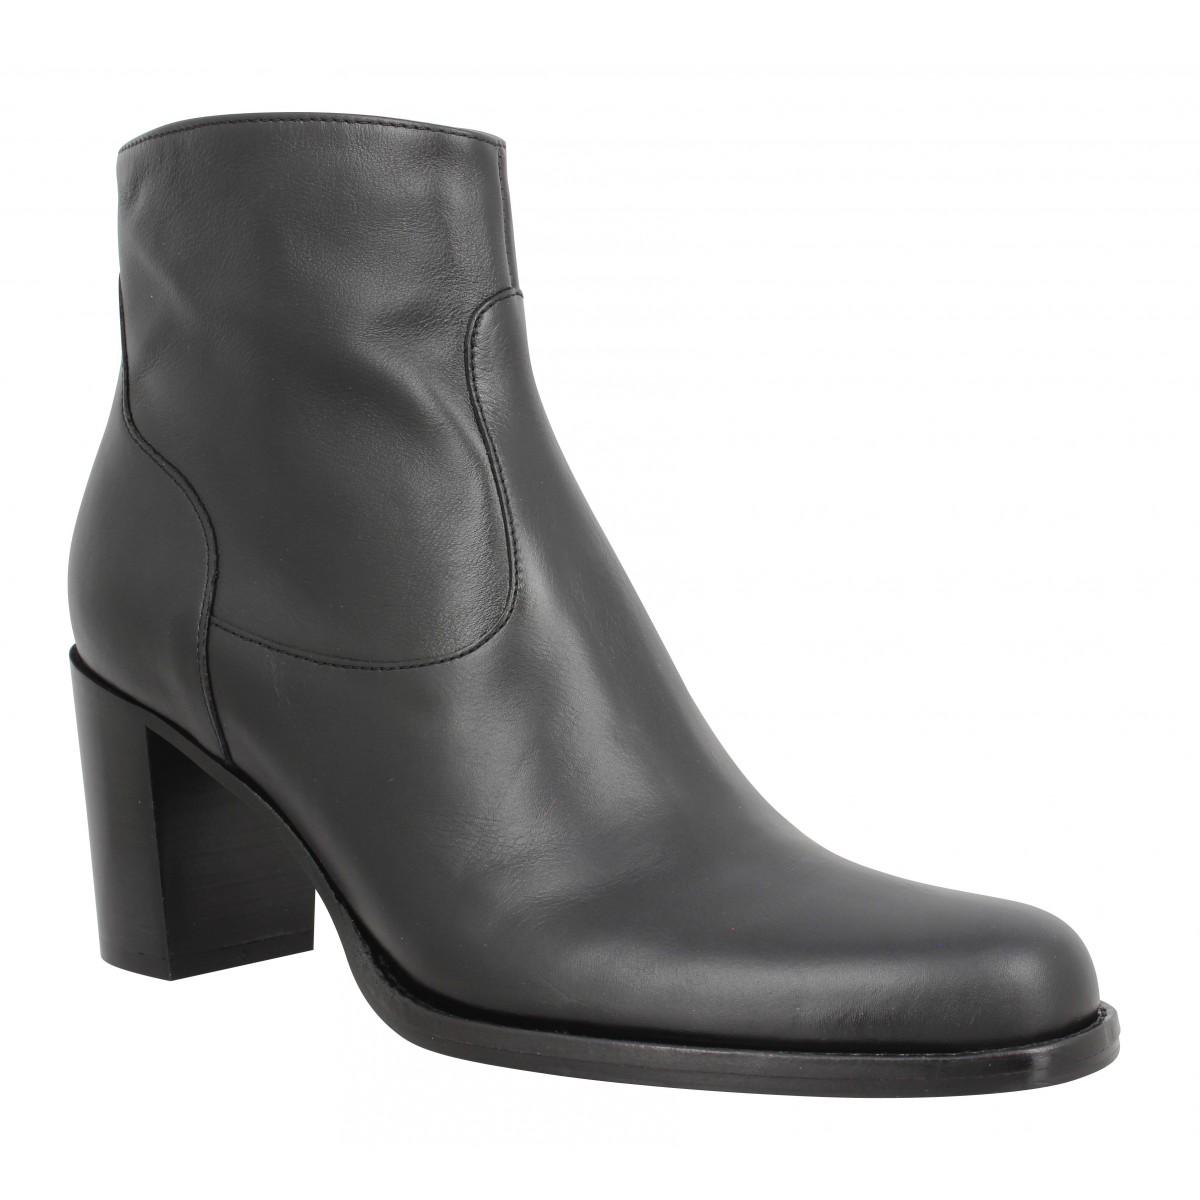 Bottines FREE LANCE Legend 7 Zip Boot cuir lisse Femme Noir